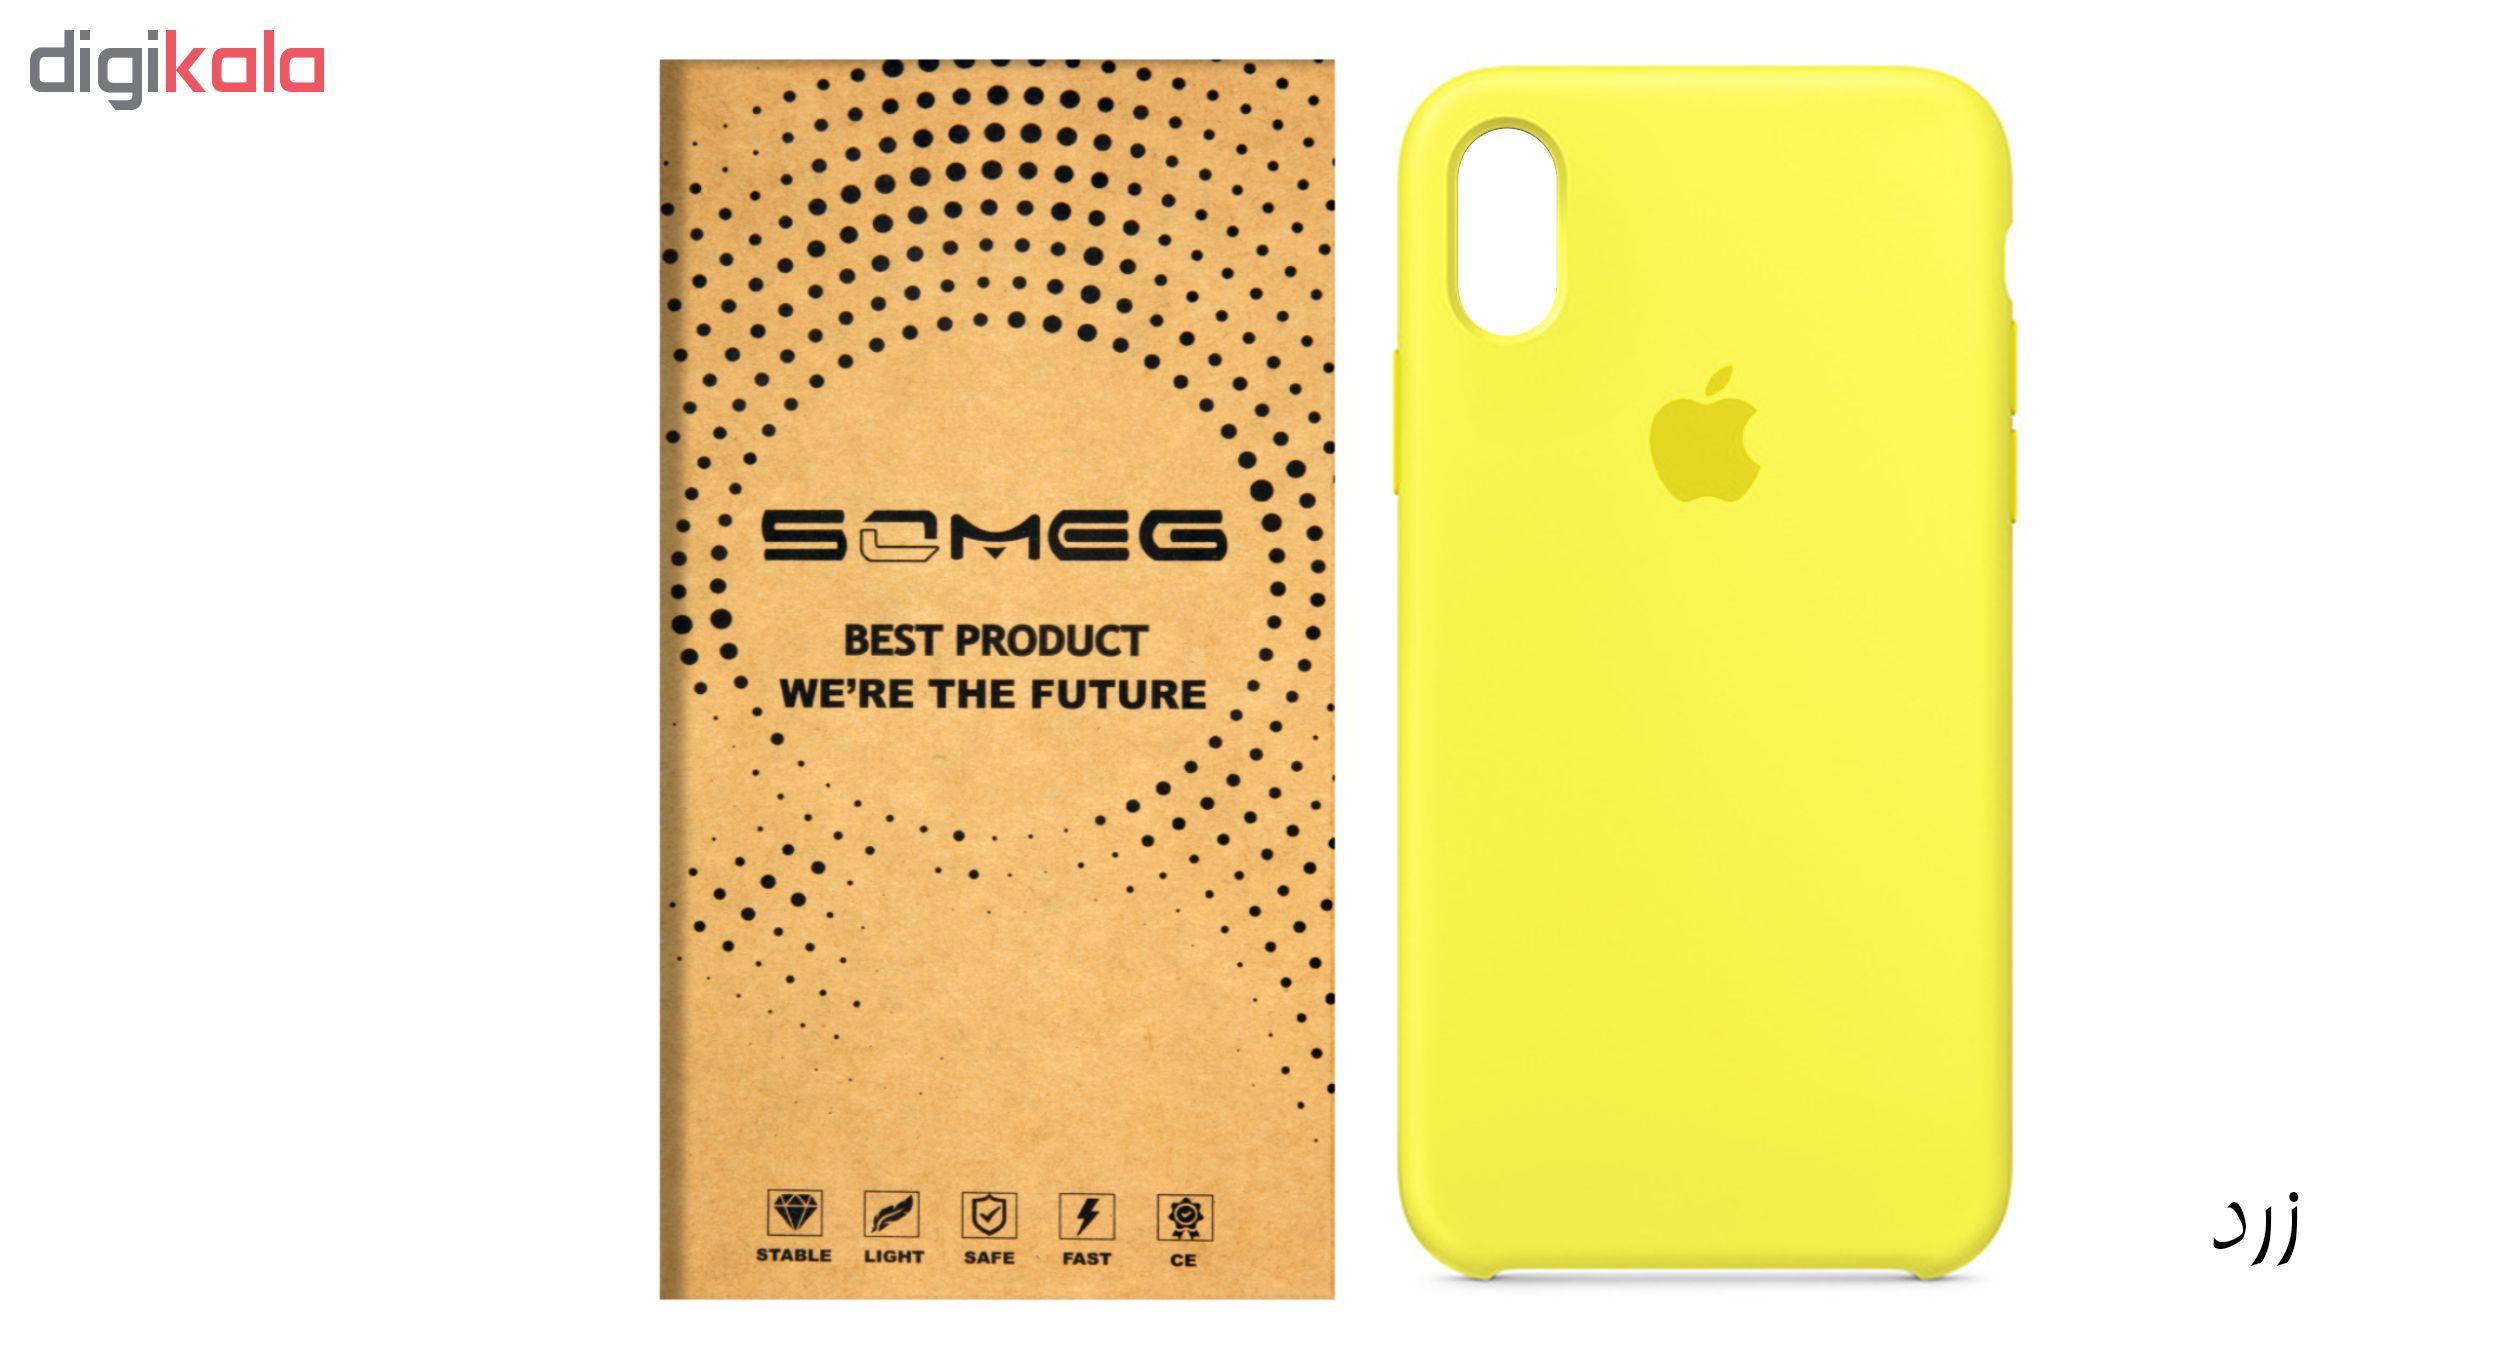 کاور سومگ مدل SIC مناسب برای گوشی موبایل اپل iPhone X  main 1 20